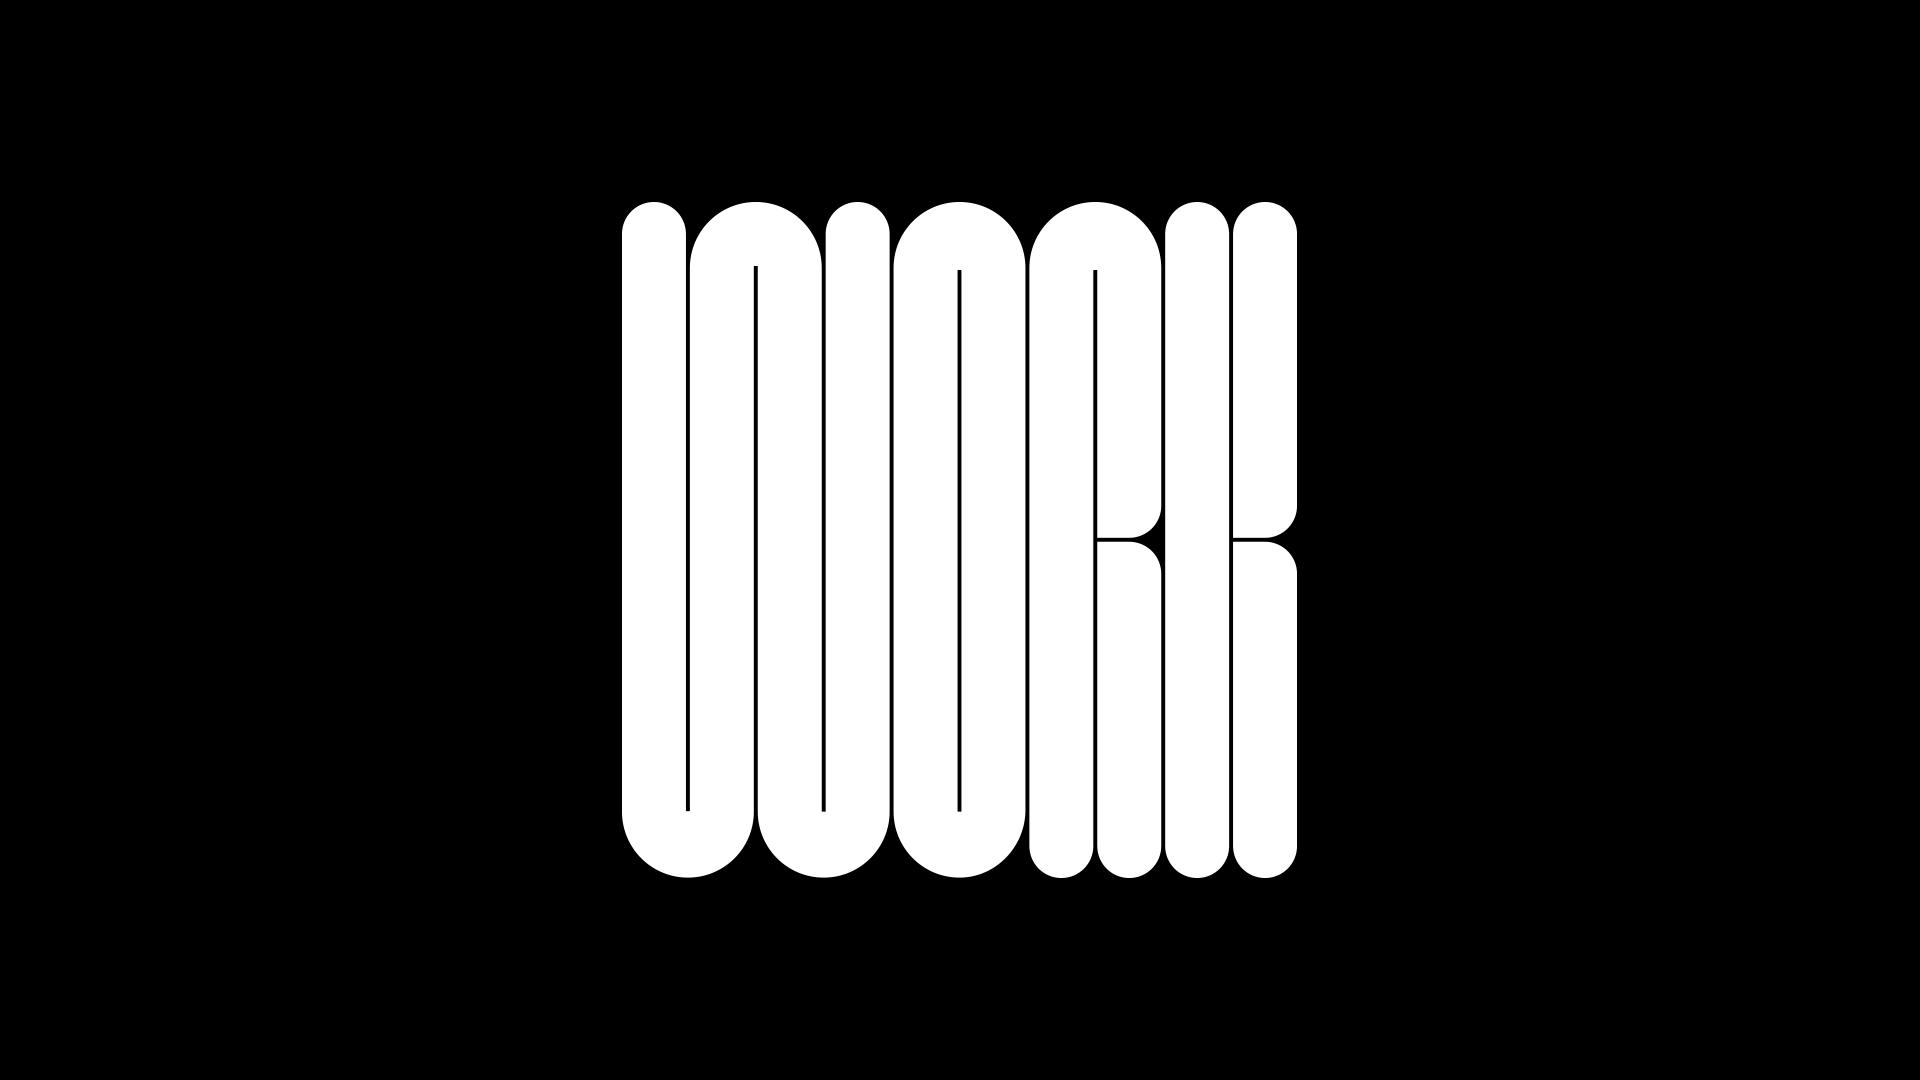 Branding & Logotypes Work by Wete Studio